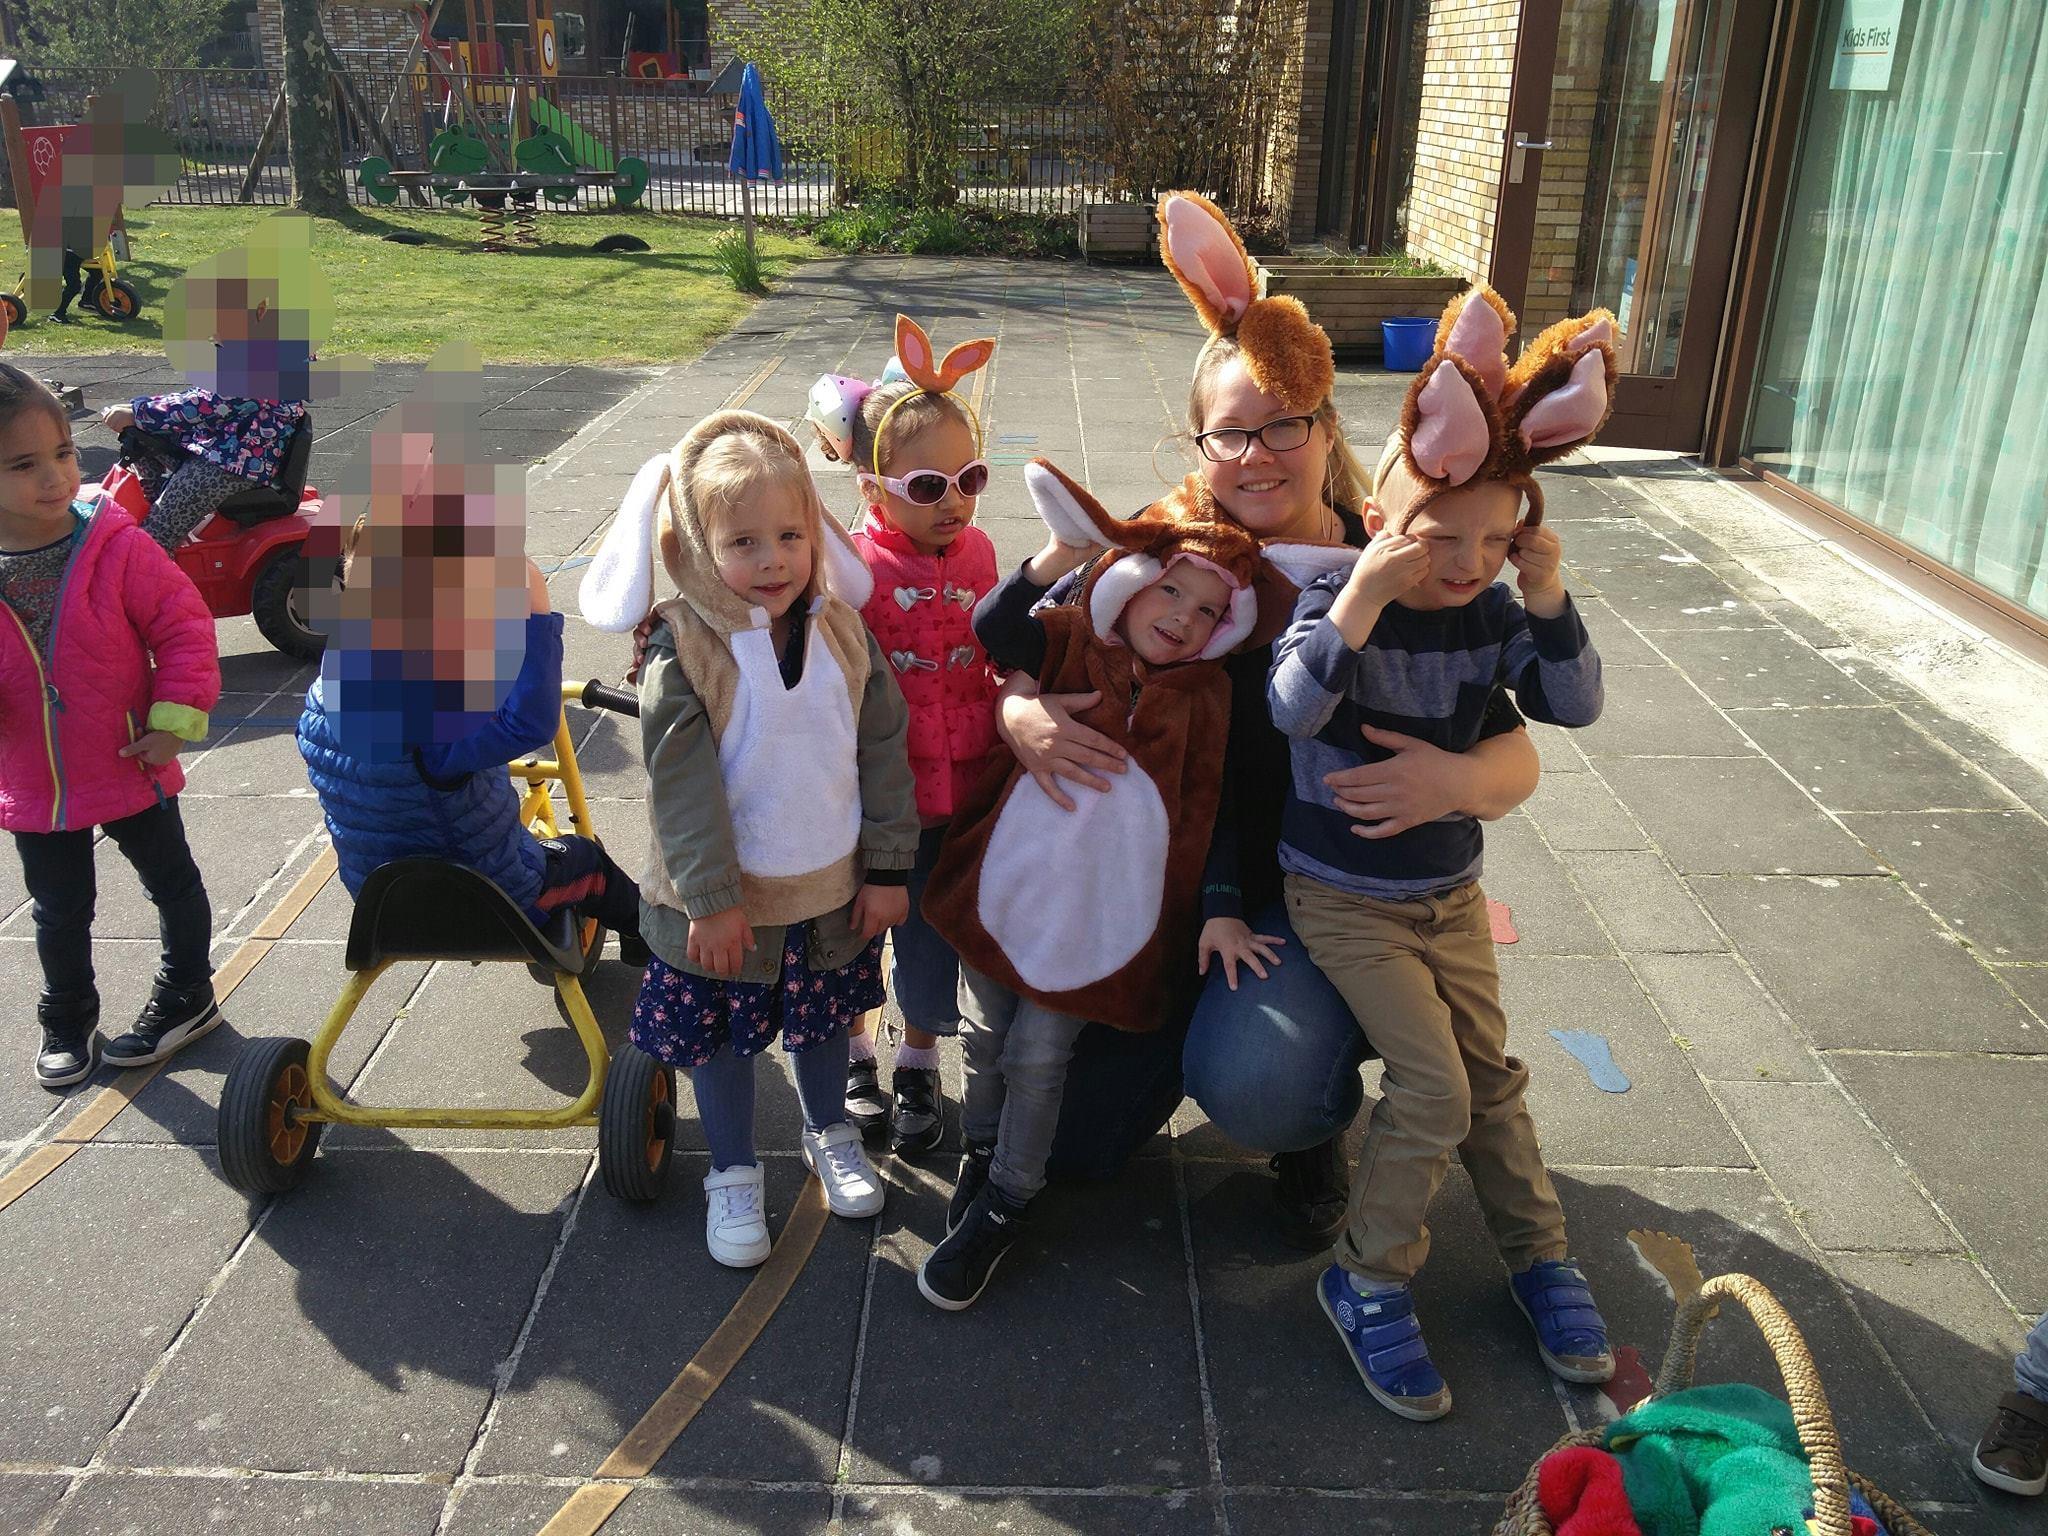 De Blokkendoos Peuteropvang Harkstede - Kids First COP groep kinderopvang